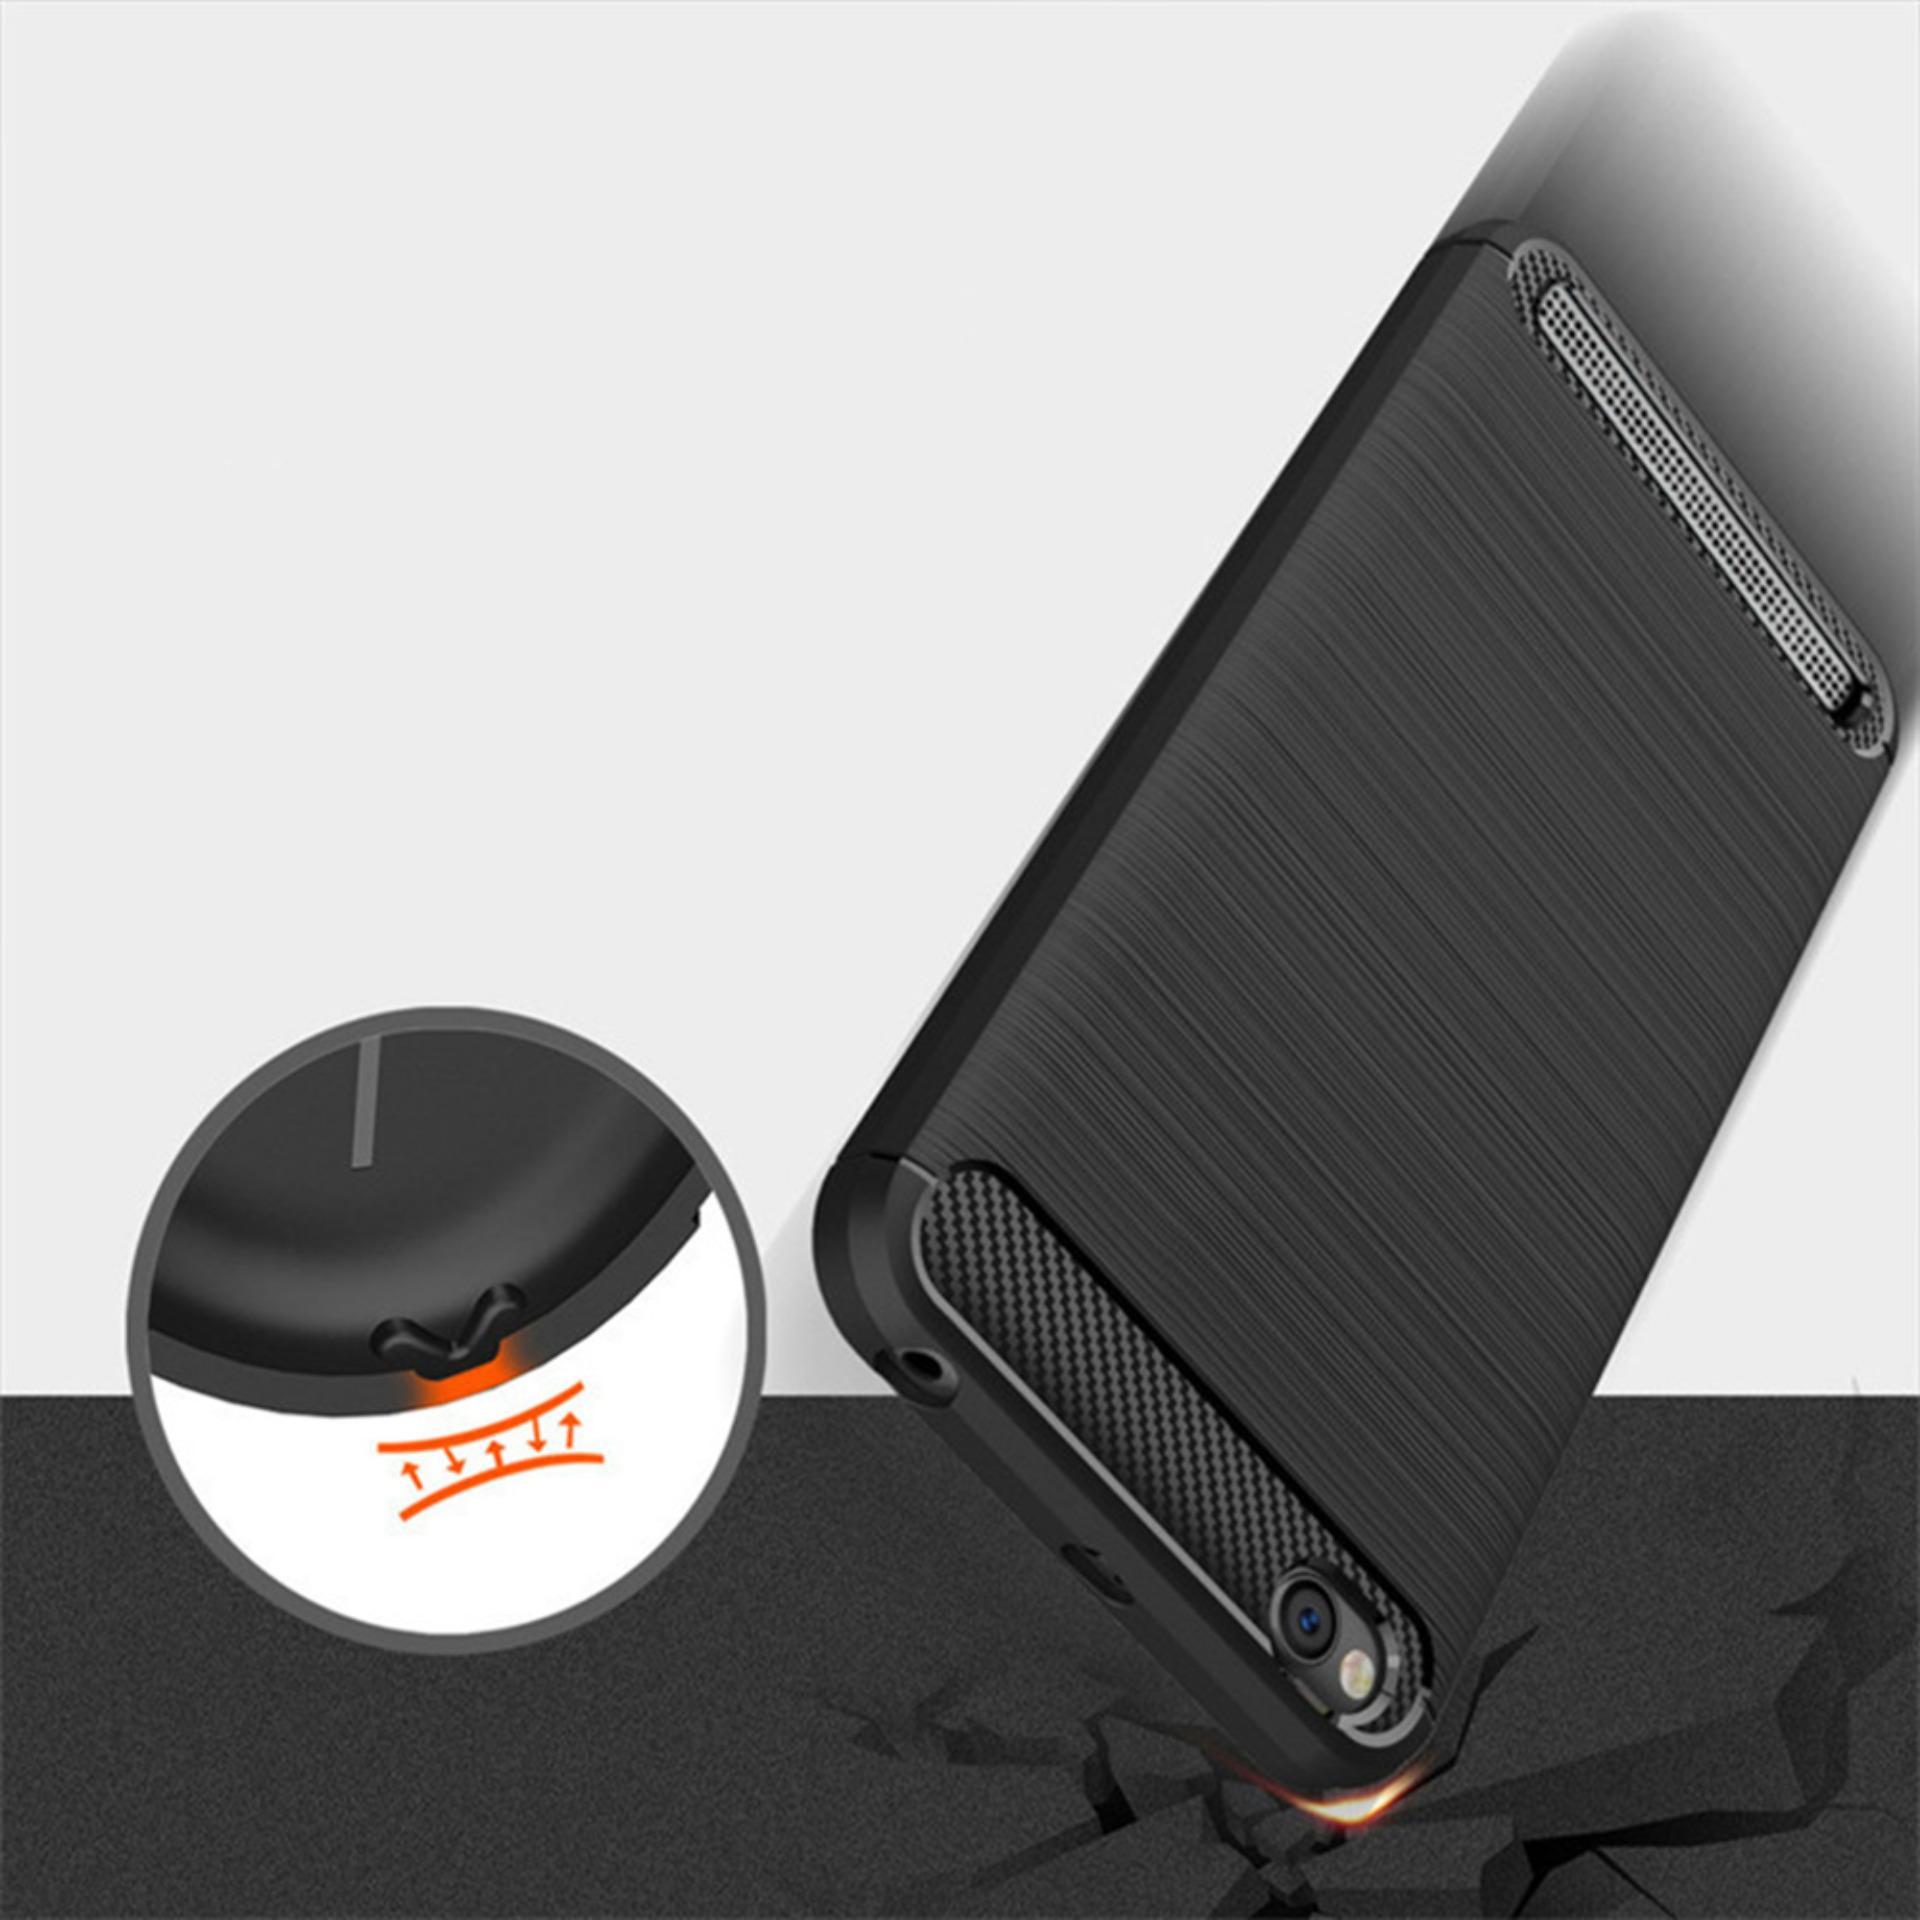 Fitur Case Slim Black Matte Xiaomi Redmi Note 5a Non Finger Print Blackmatte Silikon Baby Skin Softcase Ultra Thin